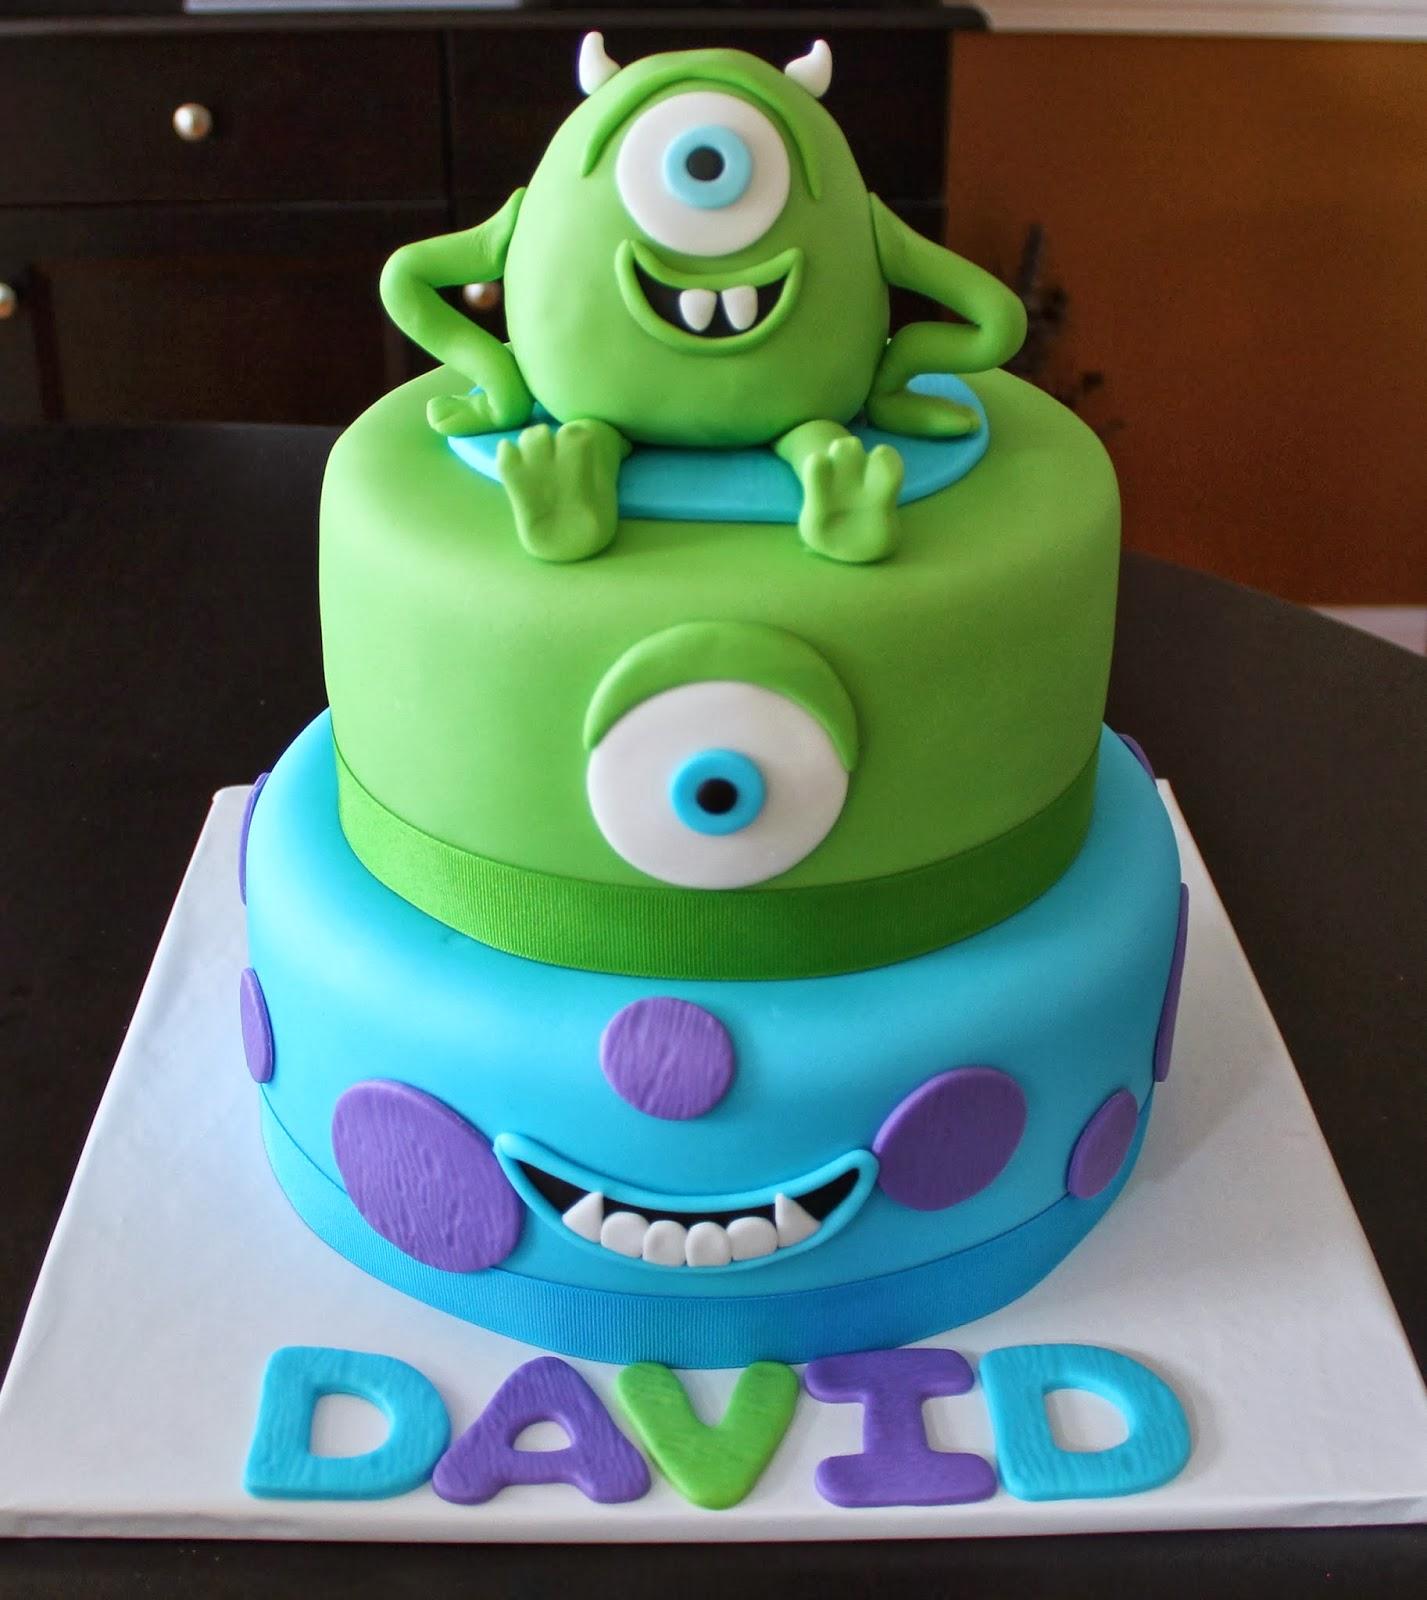 Creative Cakes by LynnMonster University Mike Wazowski Cake